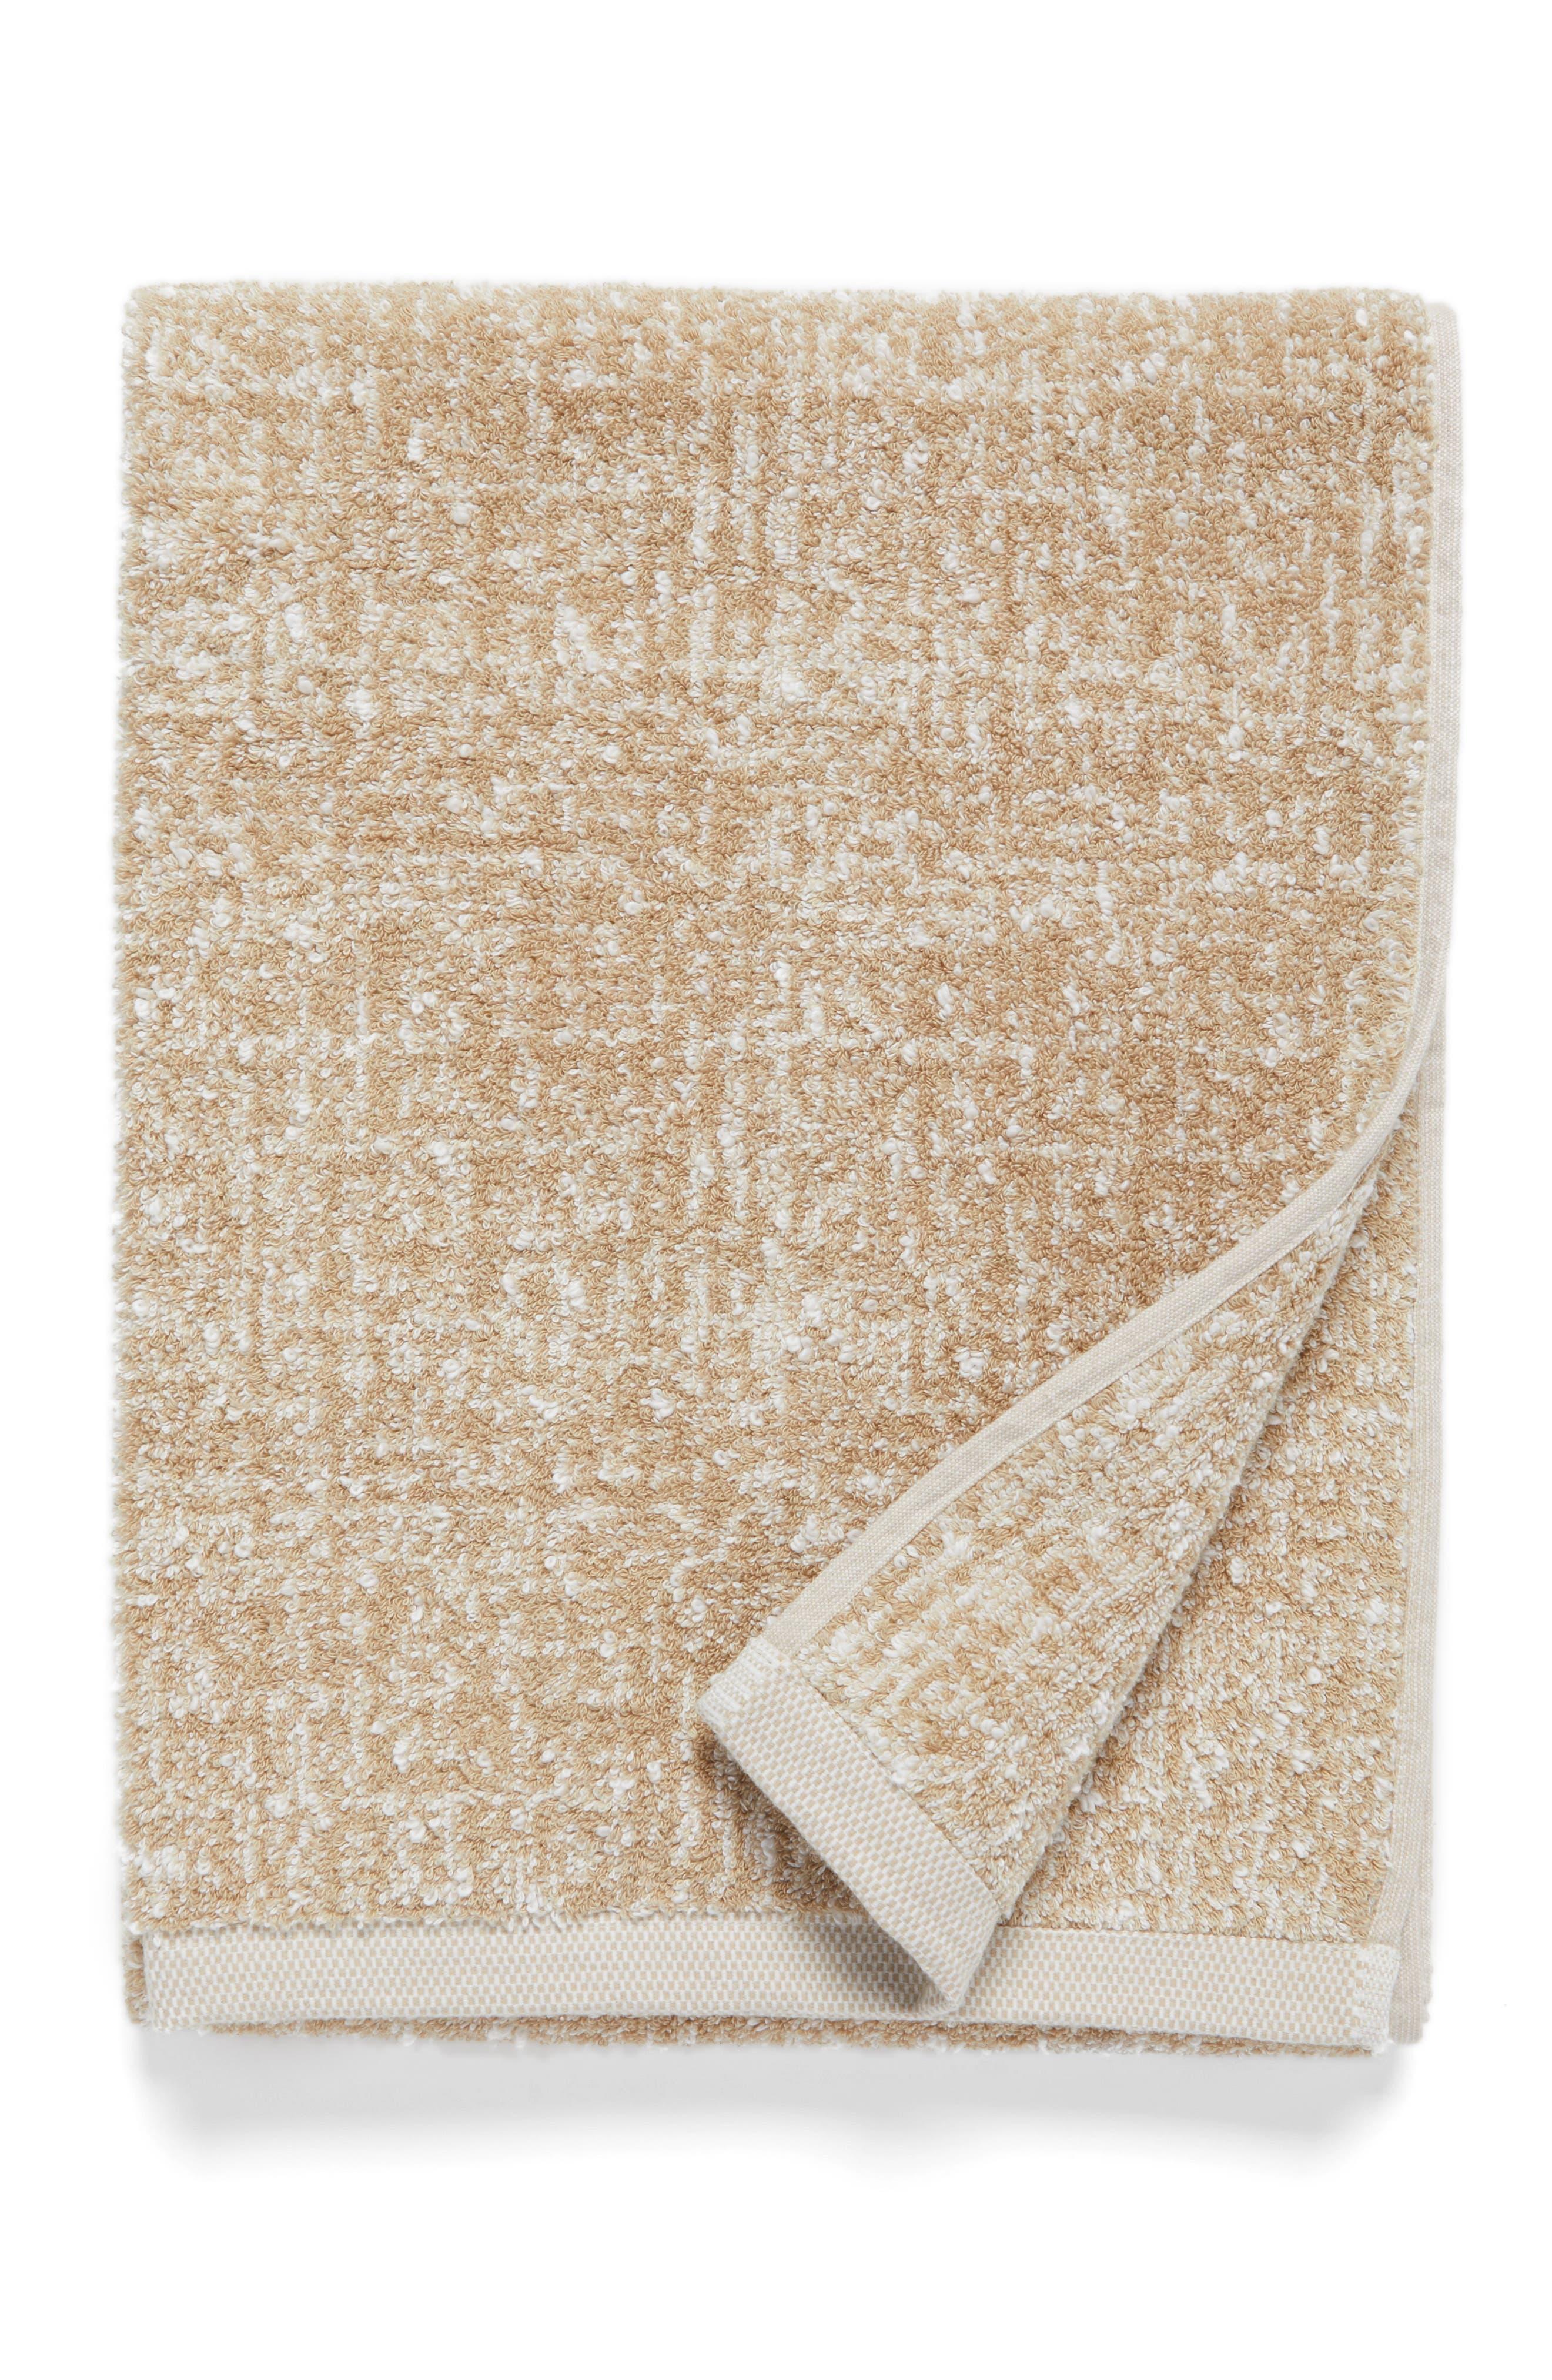 Alternate Image 1 Selected - Nordstrom at Home Tweed Jacquard Bath Towel